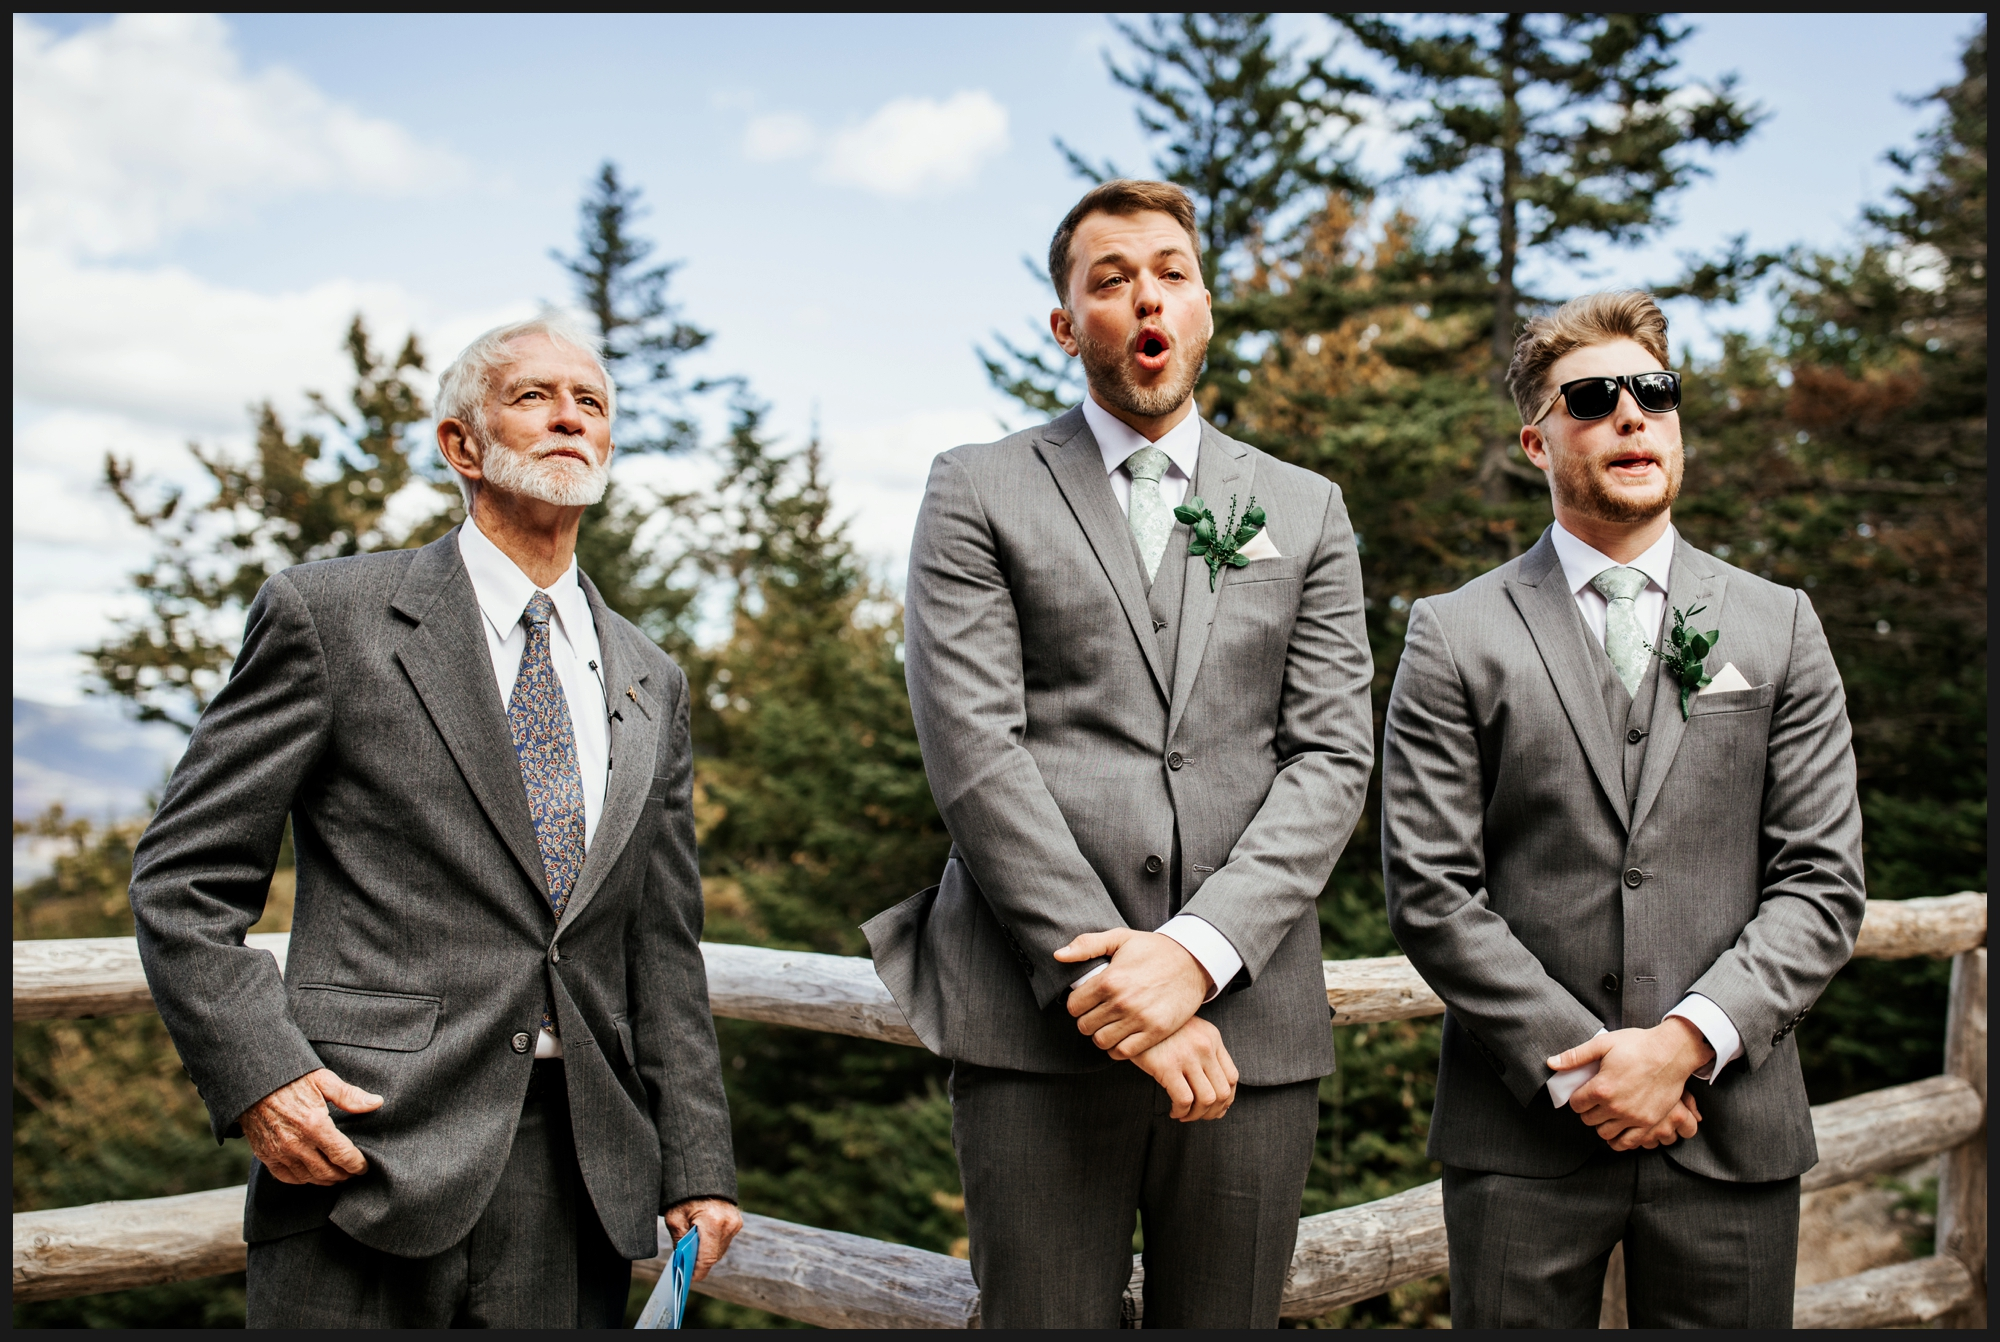 Orlando-Wedding-Photographer-destination-wedding-photographer-florida-wedding-photographer-hawaii-wedding-photographer_0134.jpg